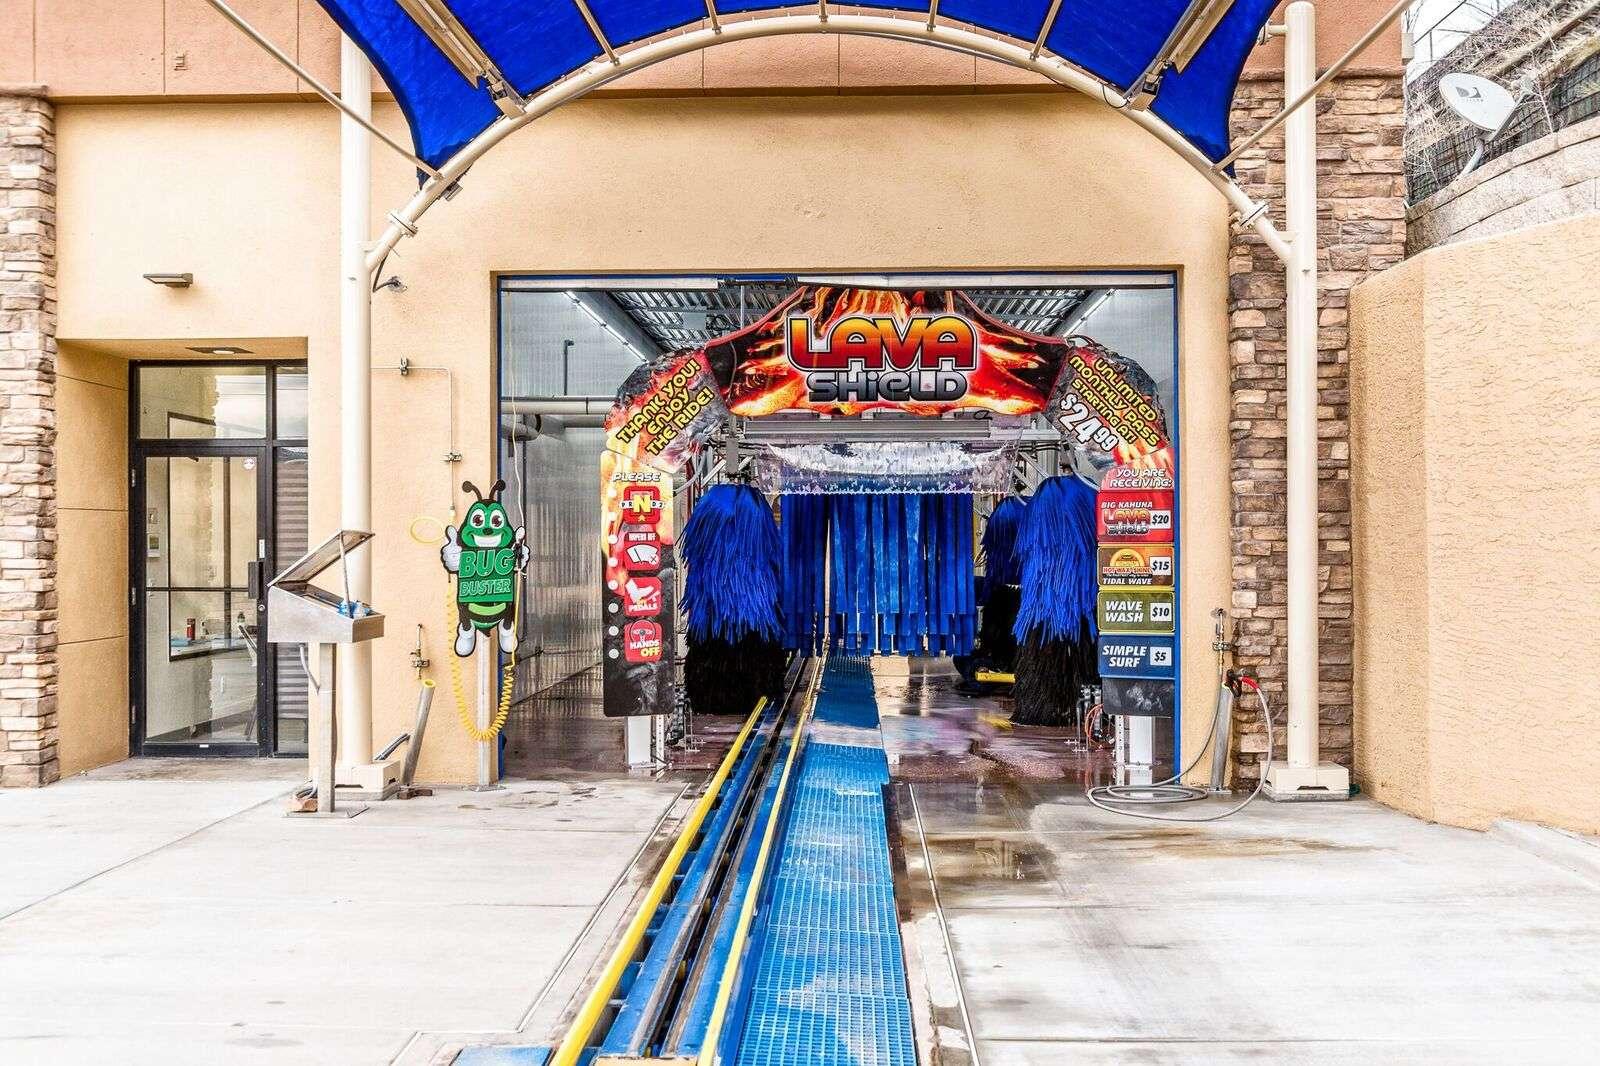 Ocean blue car wash 7837 e highway 69 prescott valley az 928 759 9130 solutioingenieria Choice Image